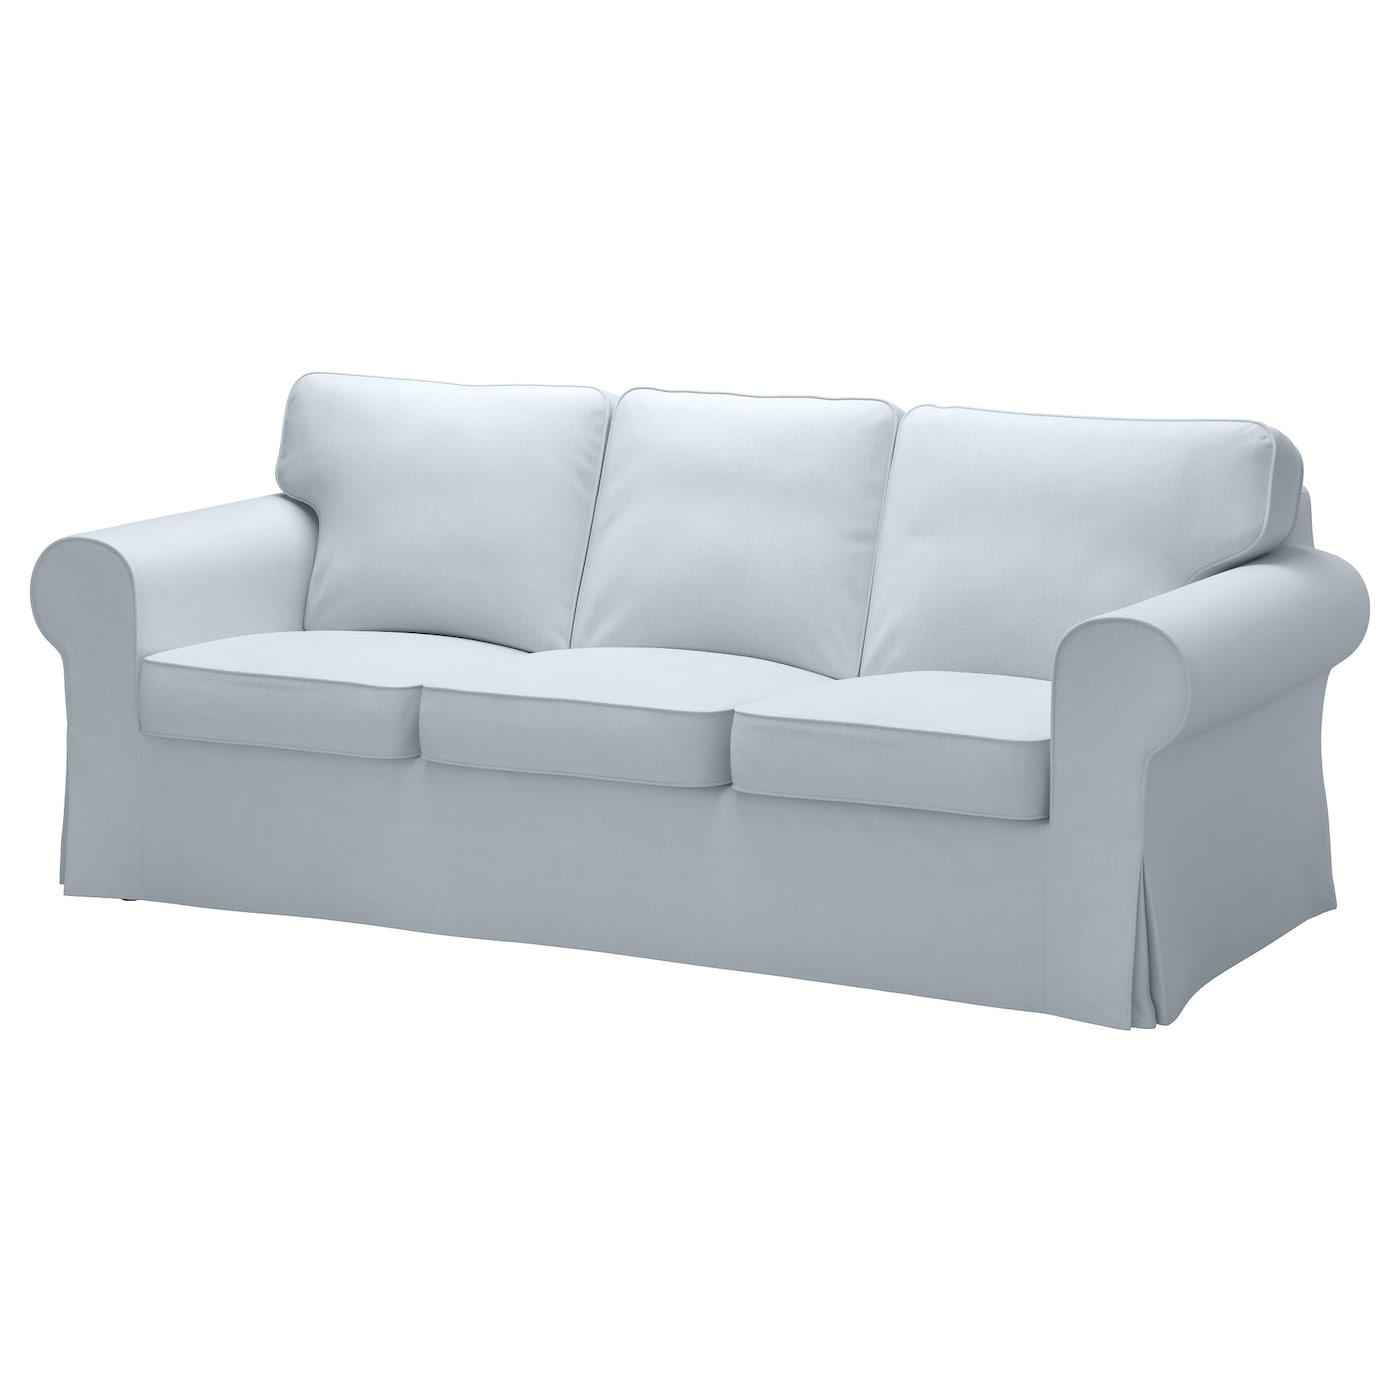 EKTORP Three-seat sofa Nordvalla light blue - IKEA